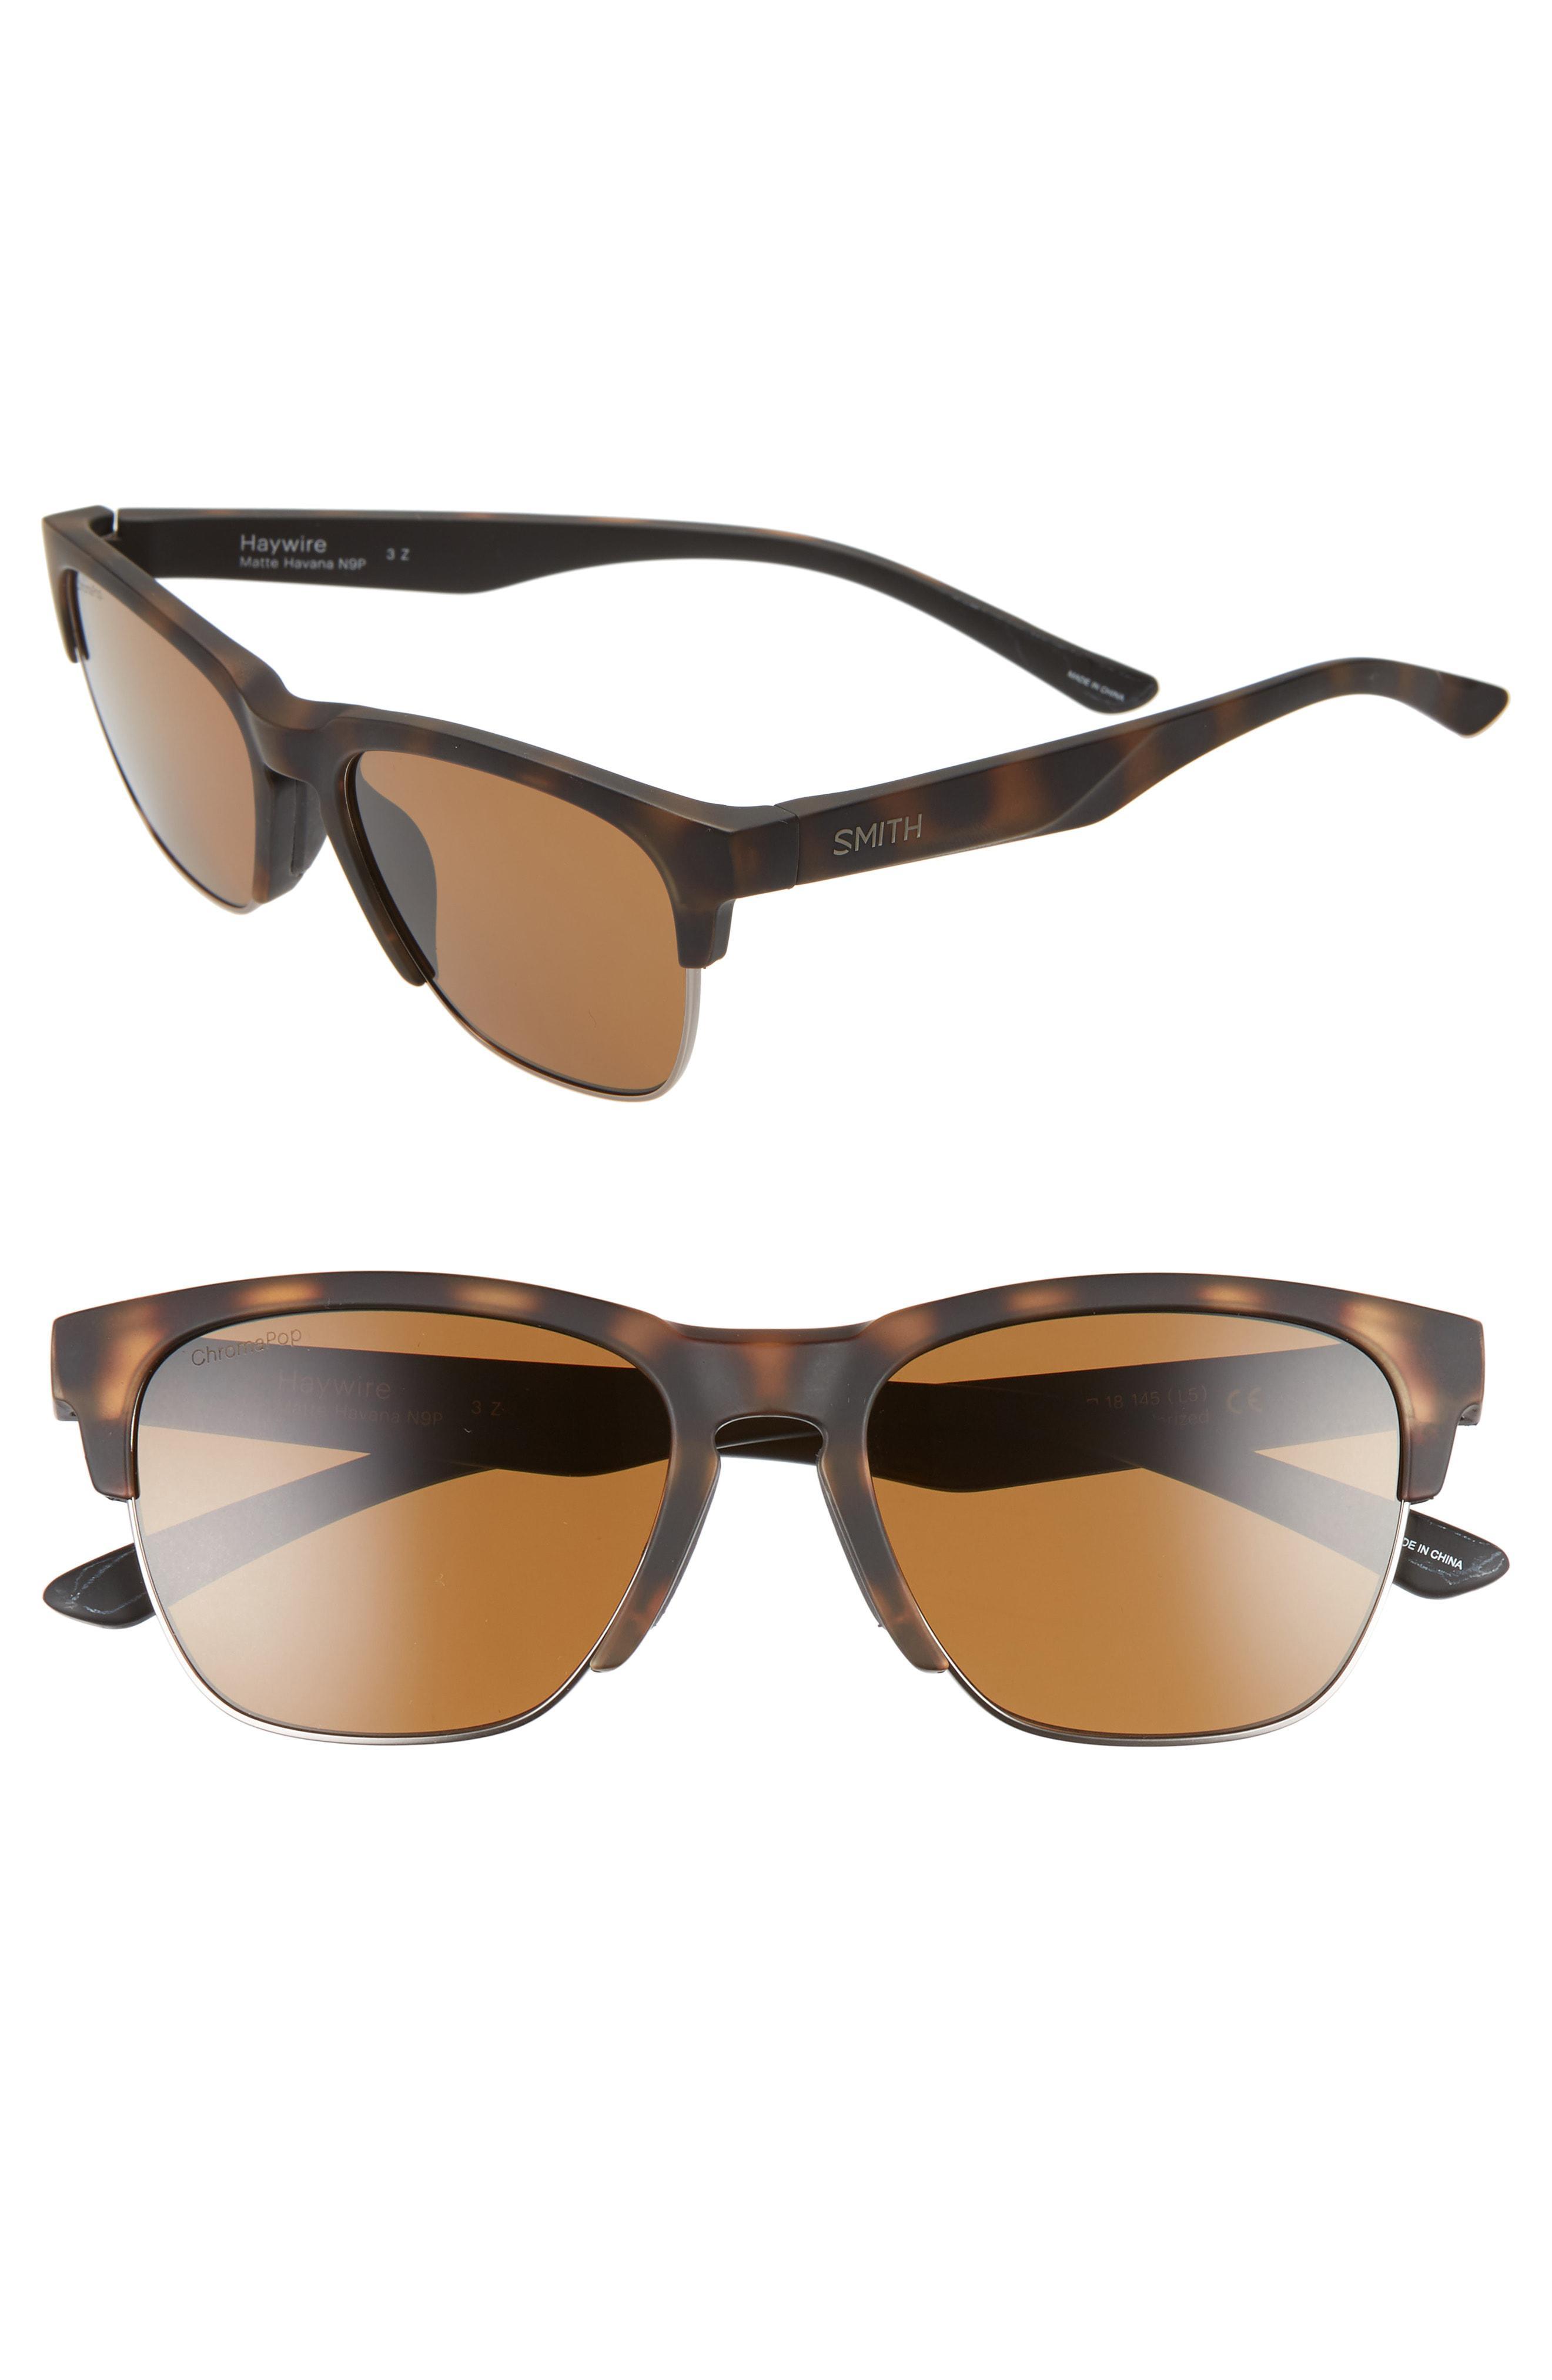 453a1000f3b Smith - Brown Haywire 55mm Chromapop(tm) Polarized Sunglasses - Lyst. View  fullscreen